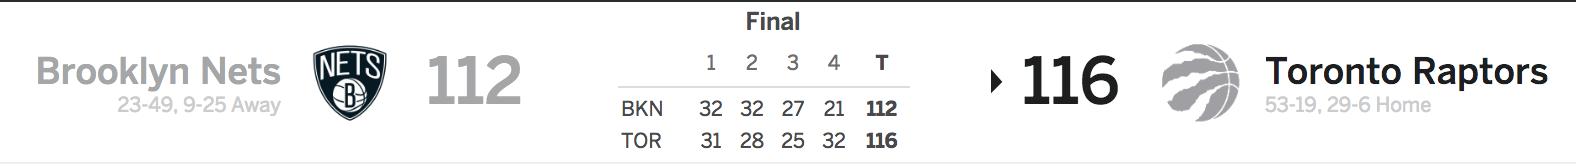 Brooklyn Nets at Toronto Raptors 3-23-18 Score